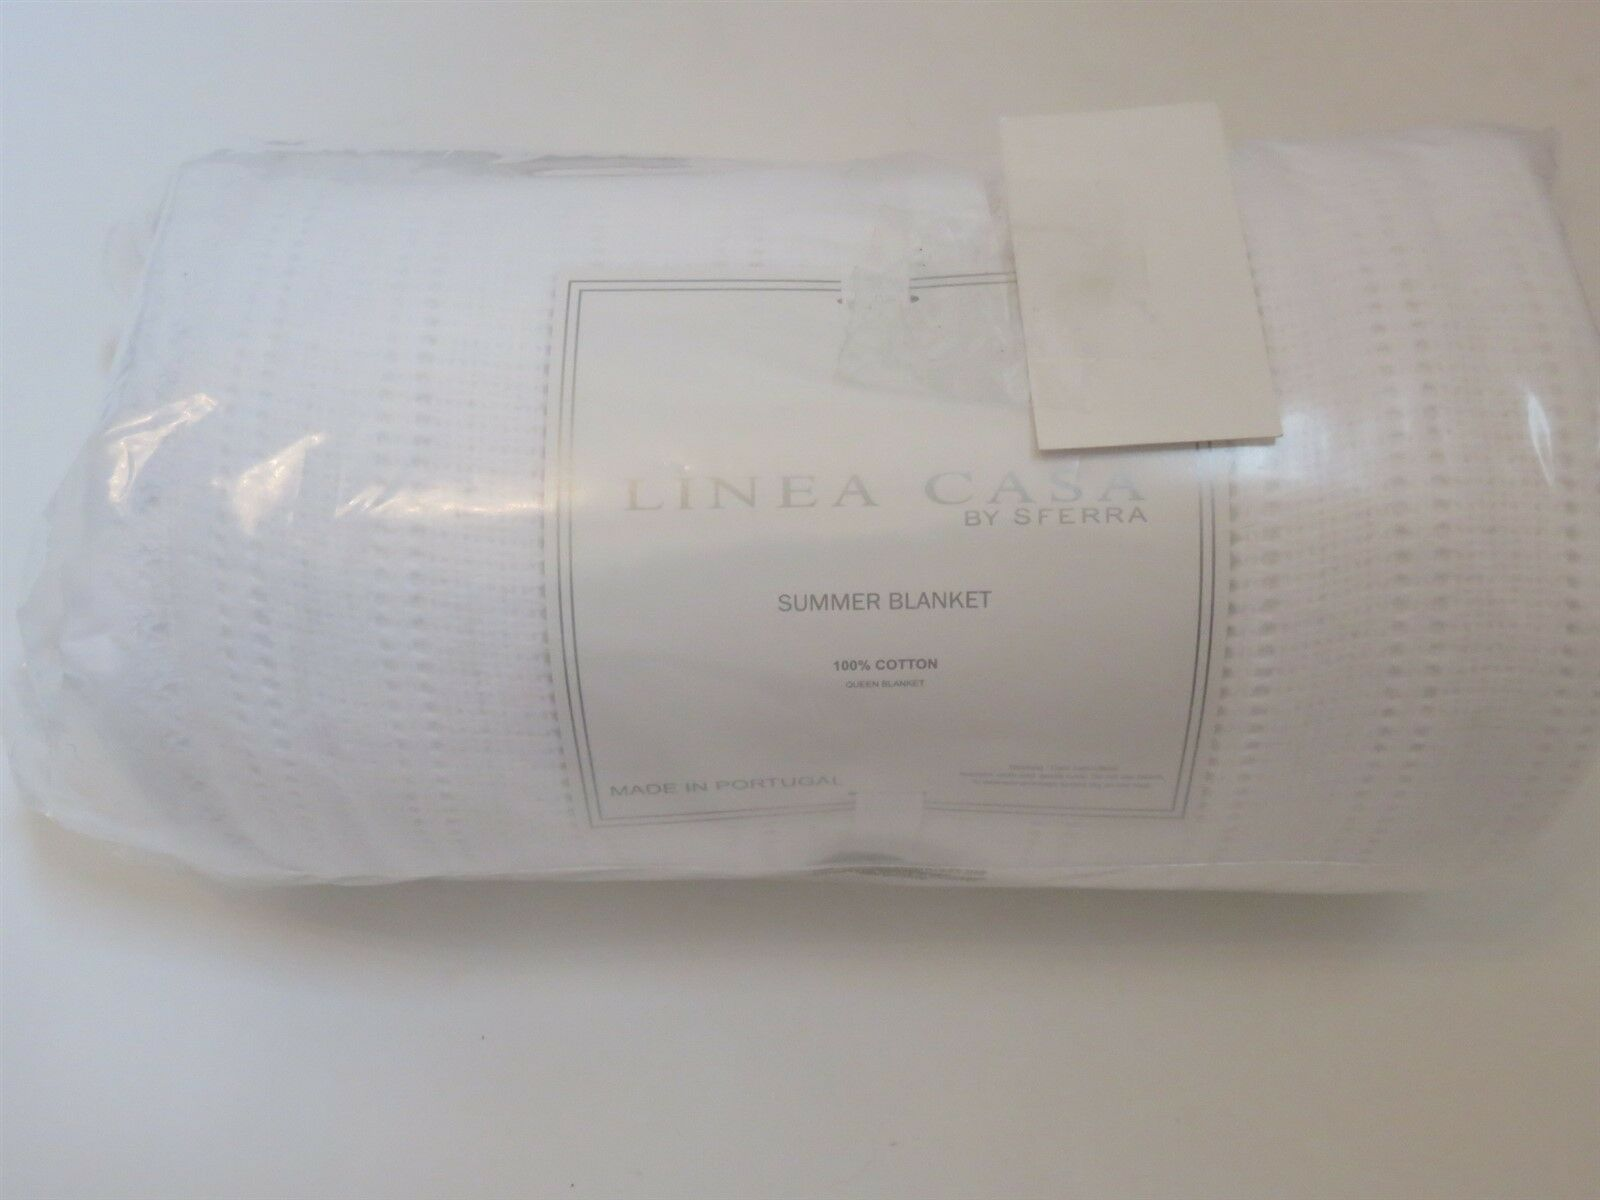 Sferra Linea Casa White ruffled Summer Queen Bed Blanket White New